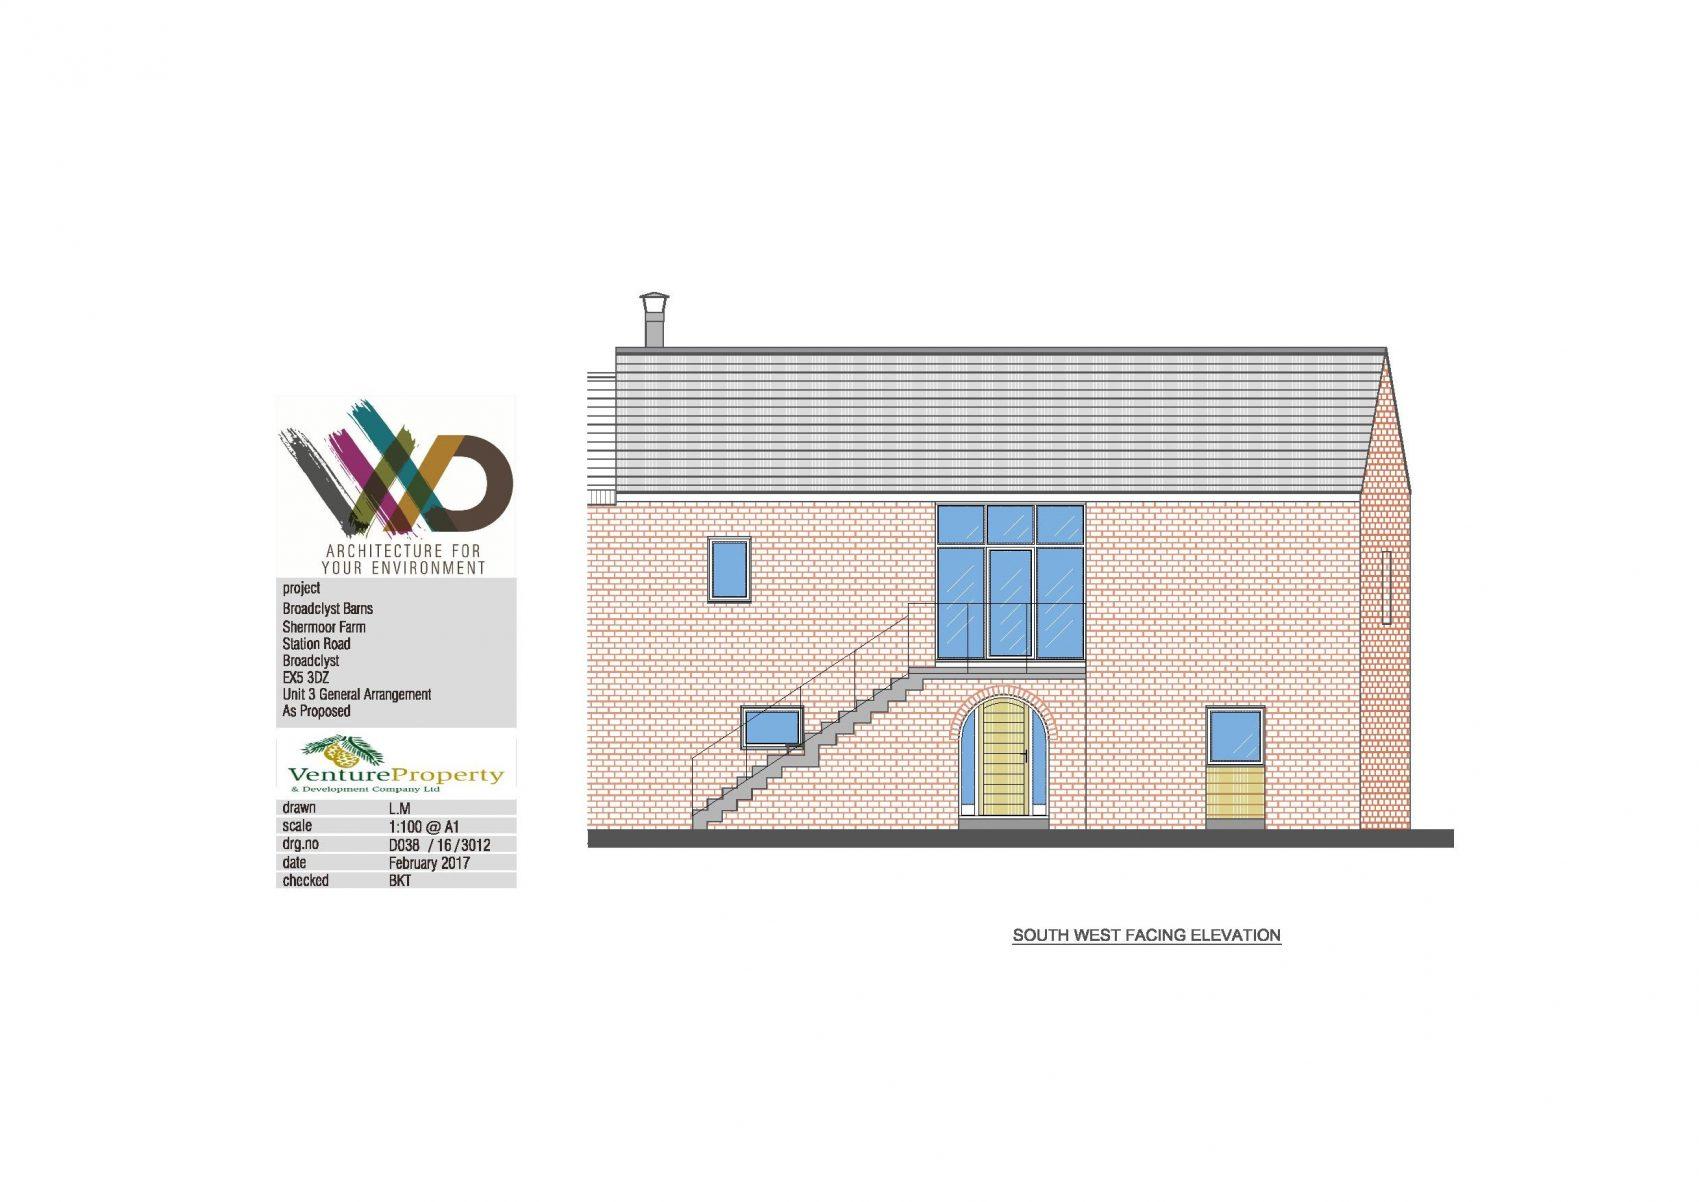 Venture Property - plot 3 (Barley Barn) Shermoor Farm